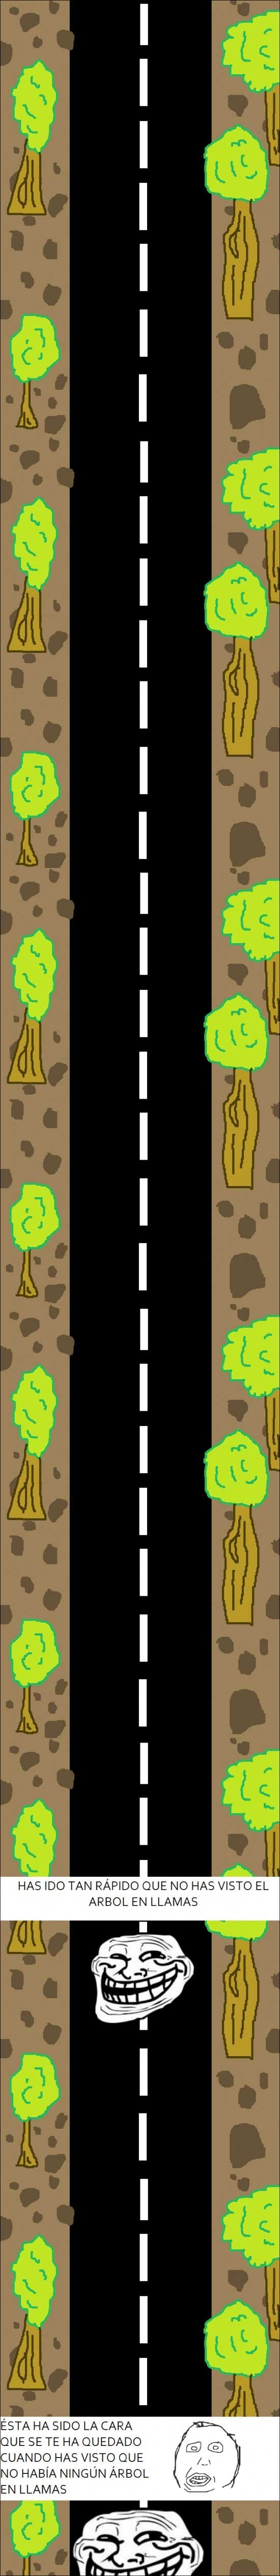 árbol,carretera,llamas,Trollface